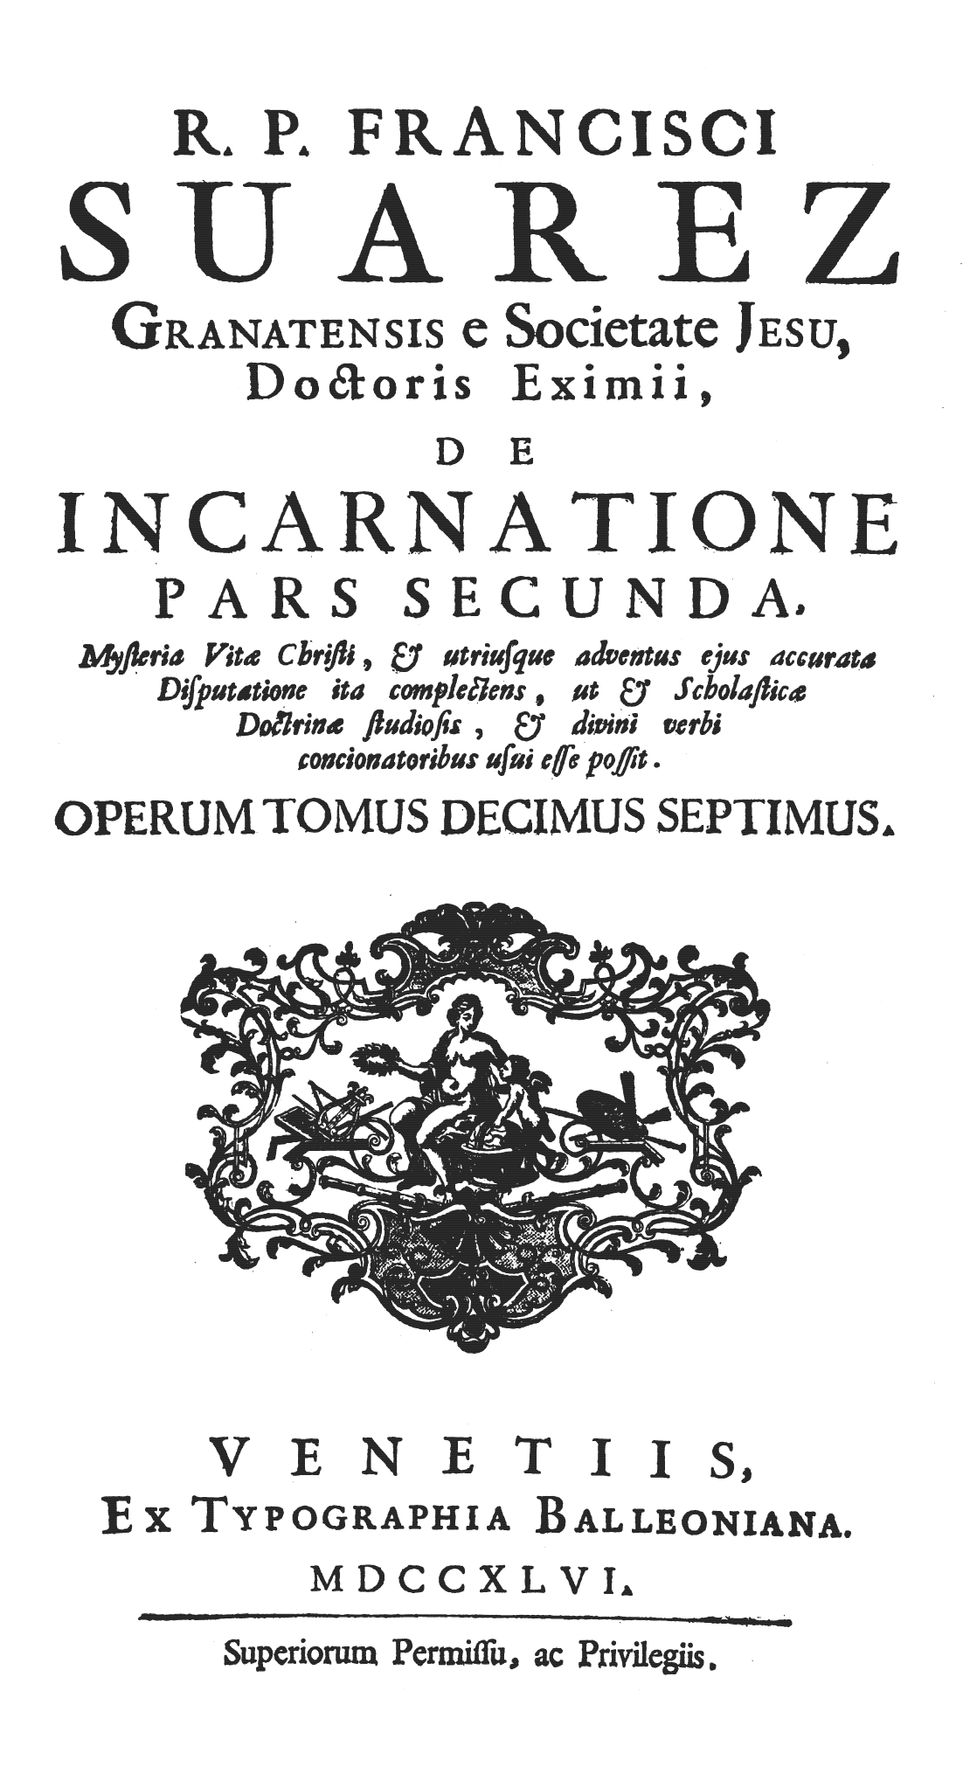 Francisco Suarez (1746) De incarnatione, pars 2